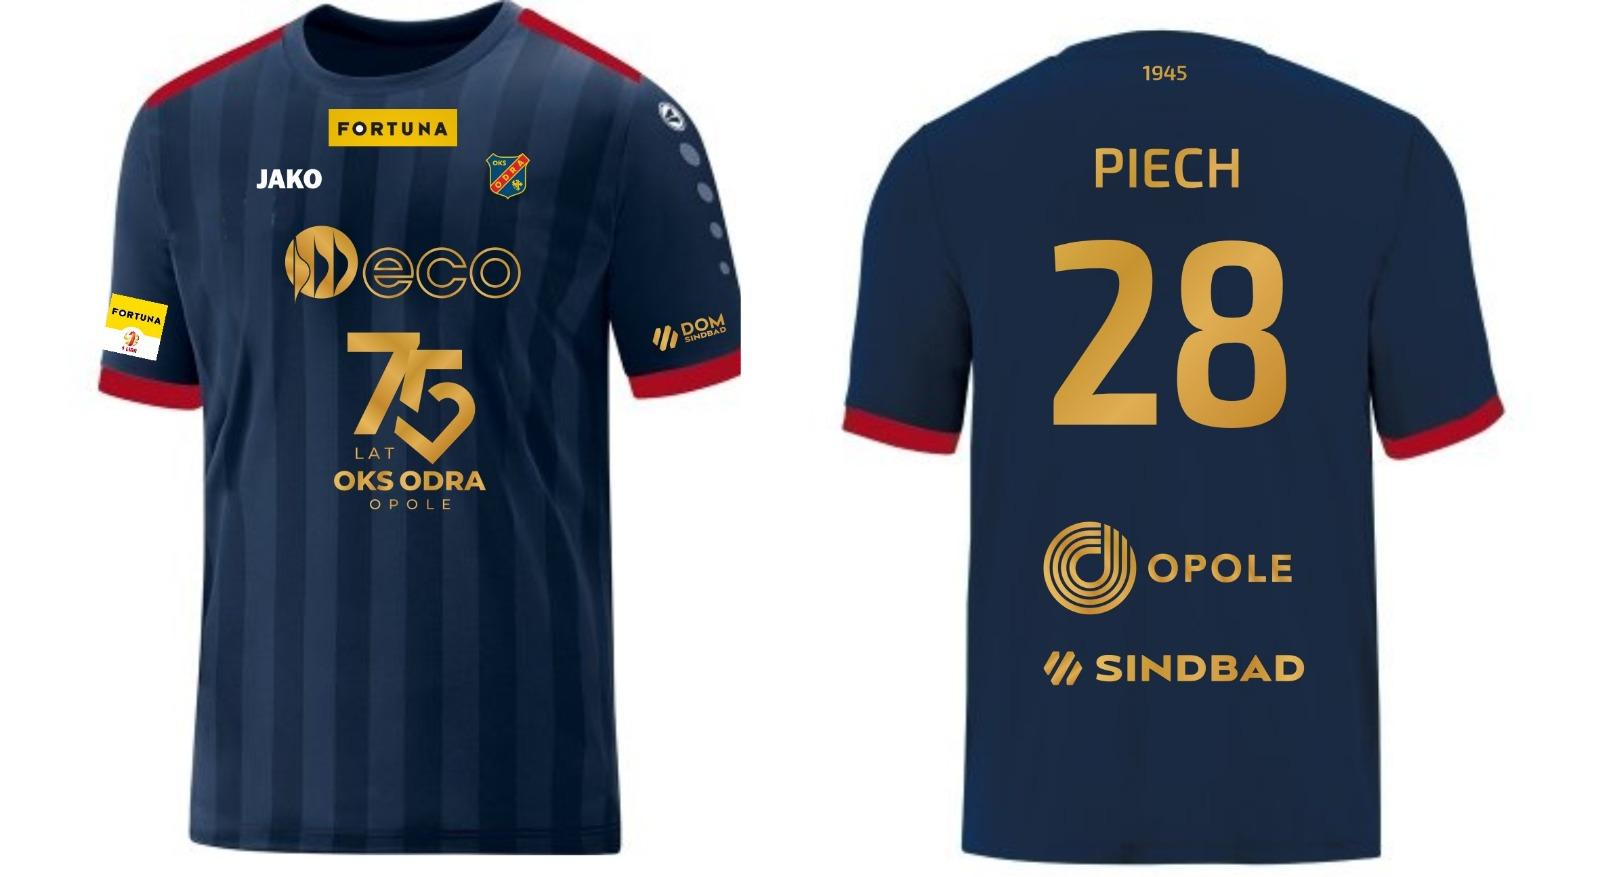 Nowe koszulki Odry